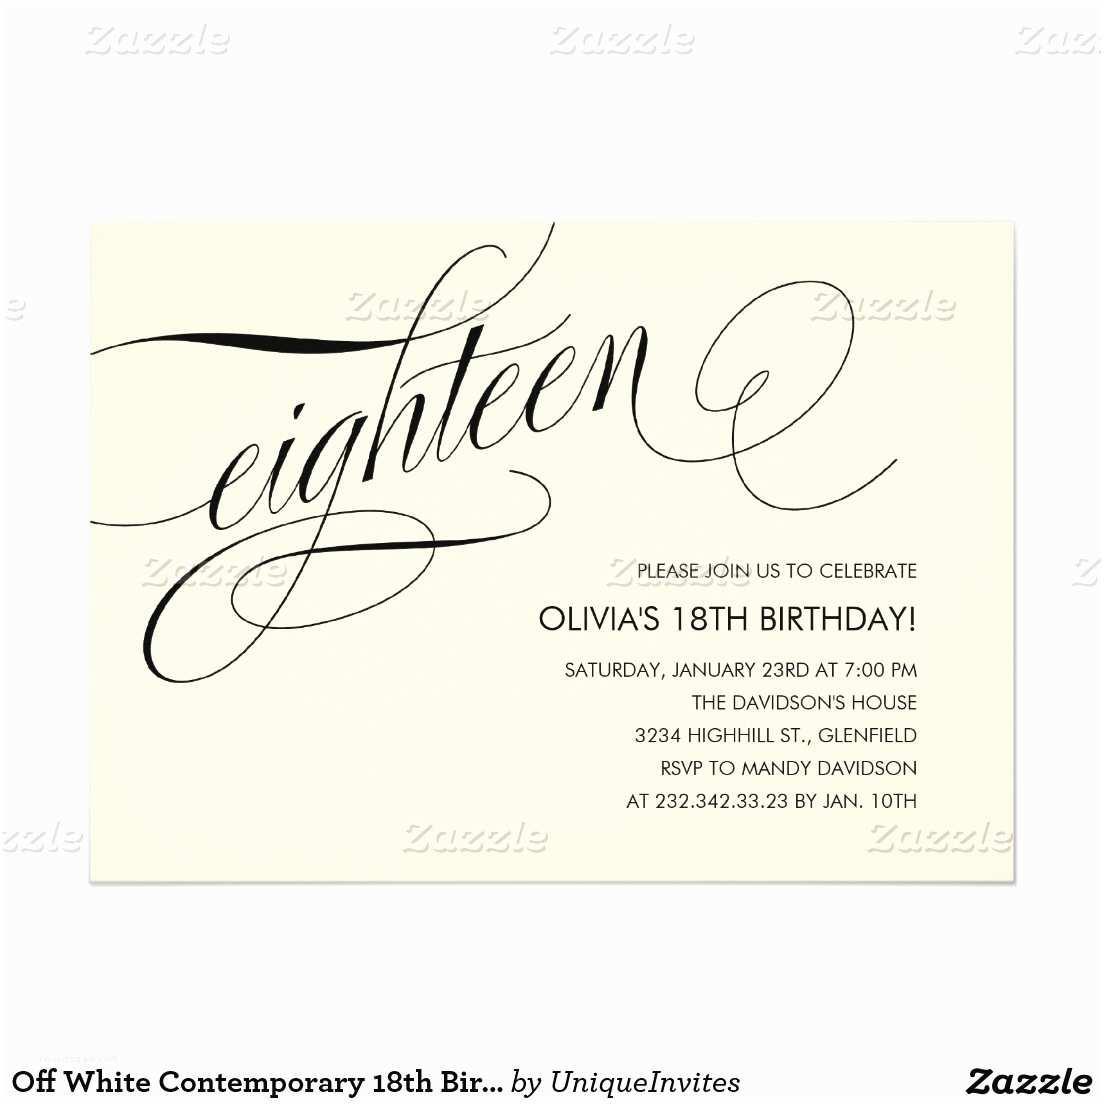 Cute Wedding Invitation Wording Samples: Debut Invitation Wordings Sample